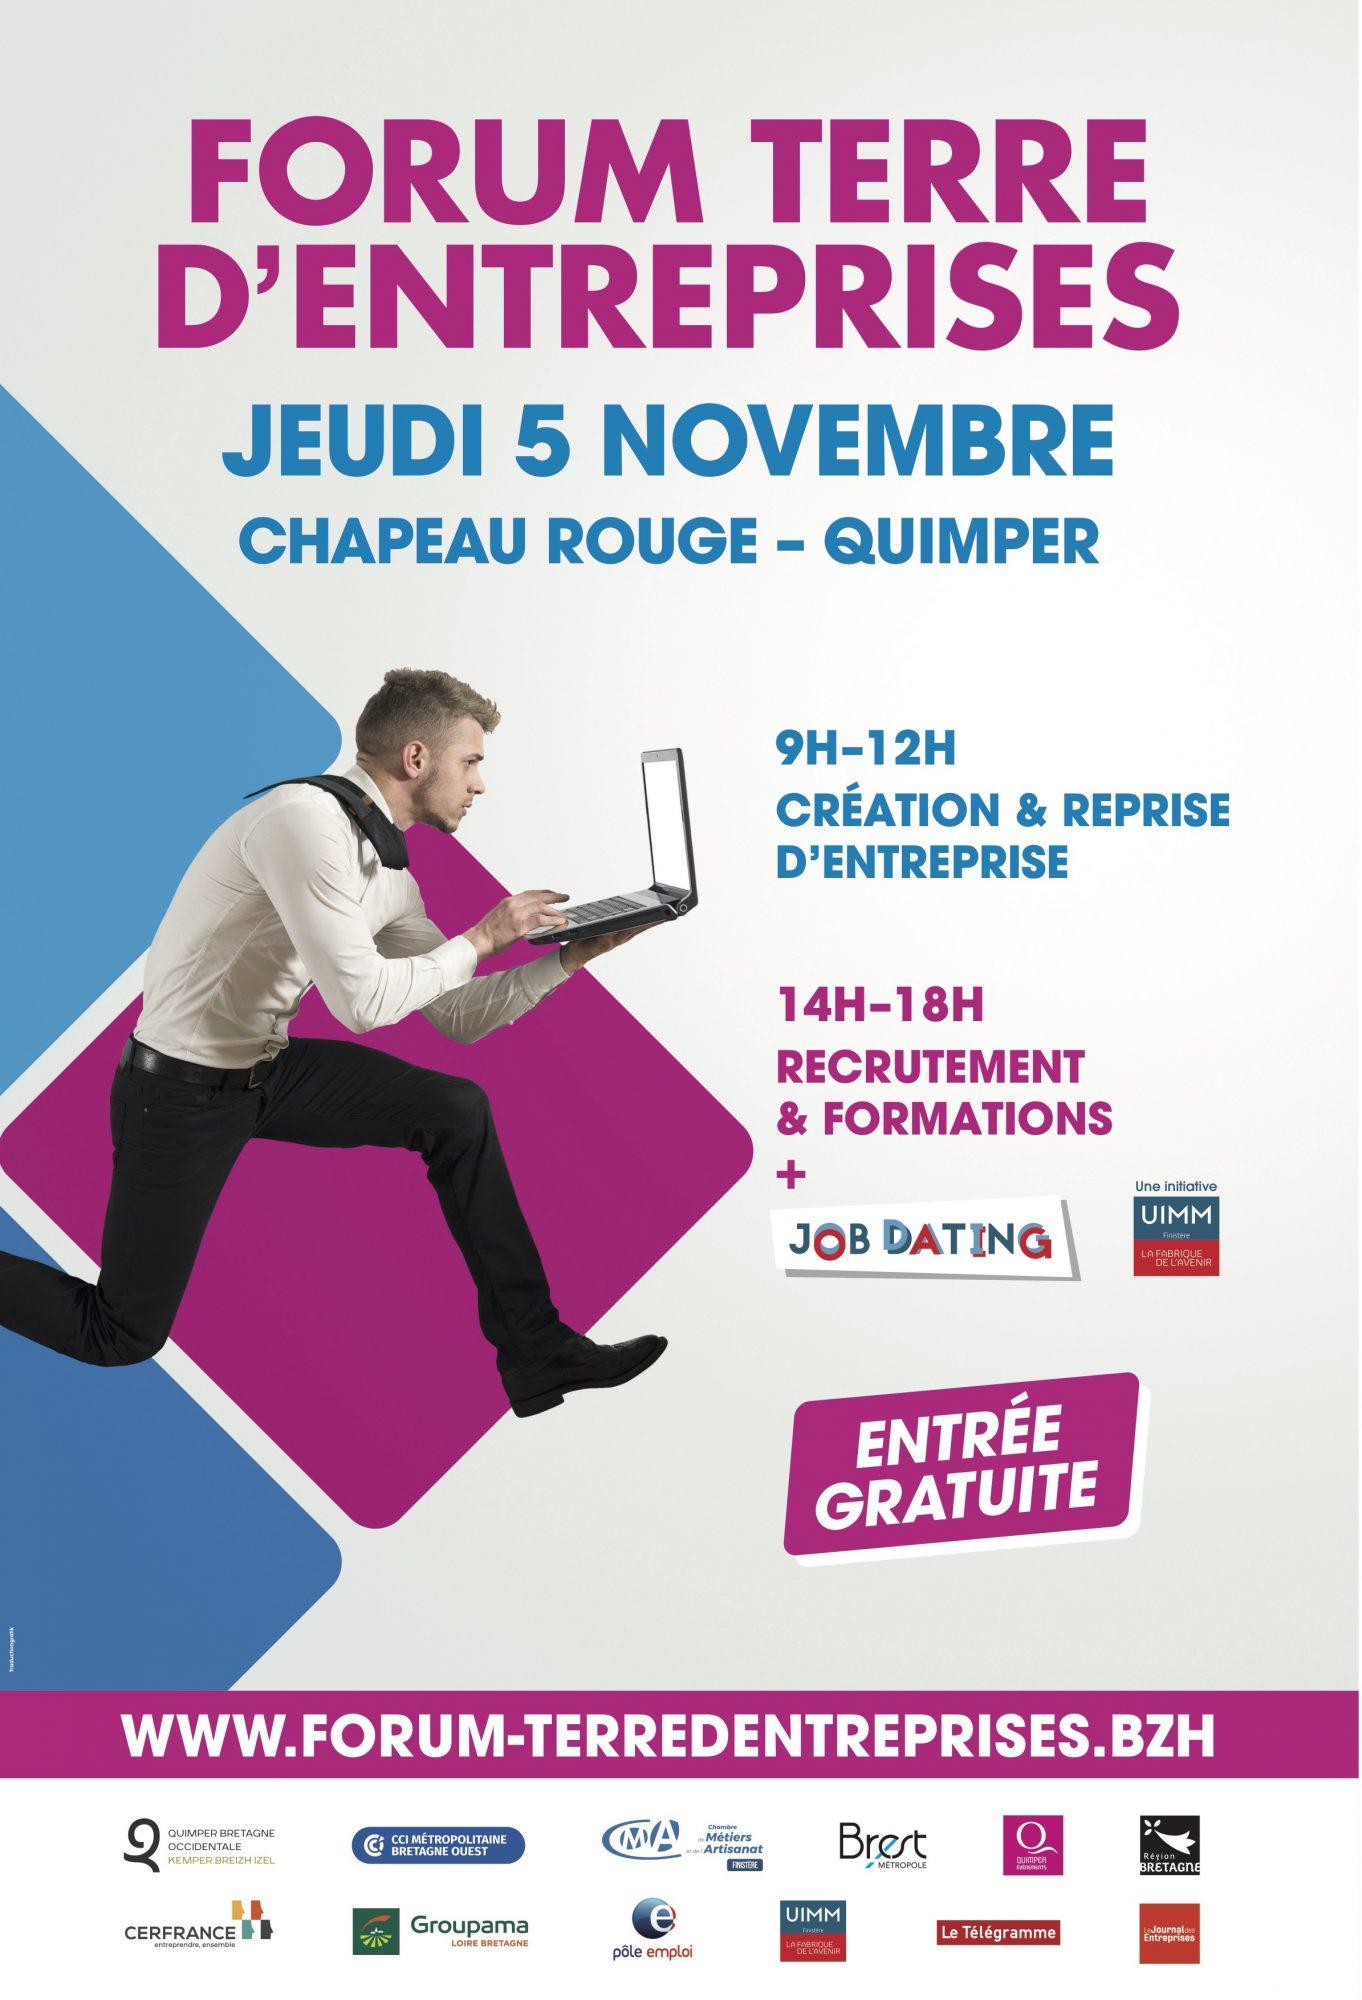 Forum terre d'entreprises, Quimper, 5/11/2020